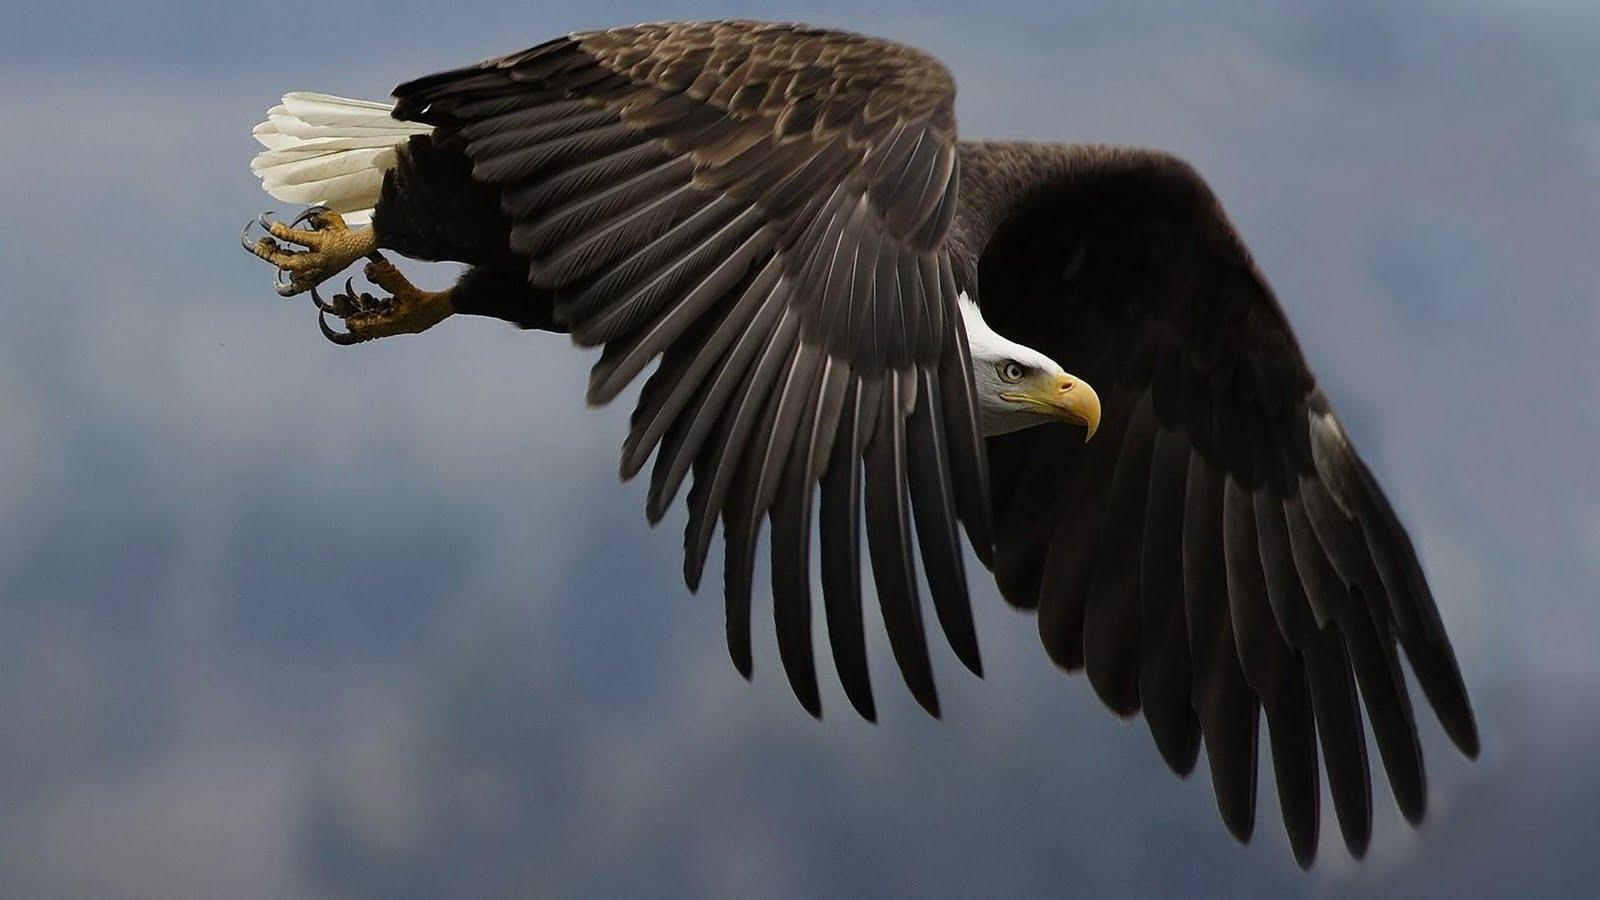 Wonderful Wallpaper Horse Eagle - eagle-flying-wallpaper  Picture_52616.jpg